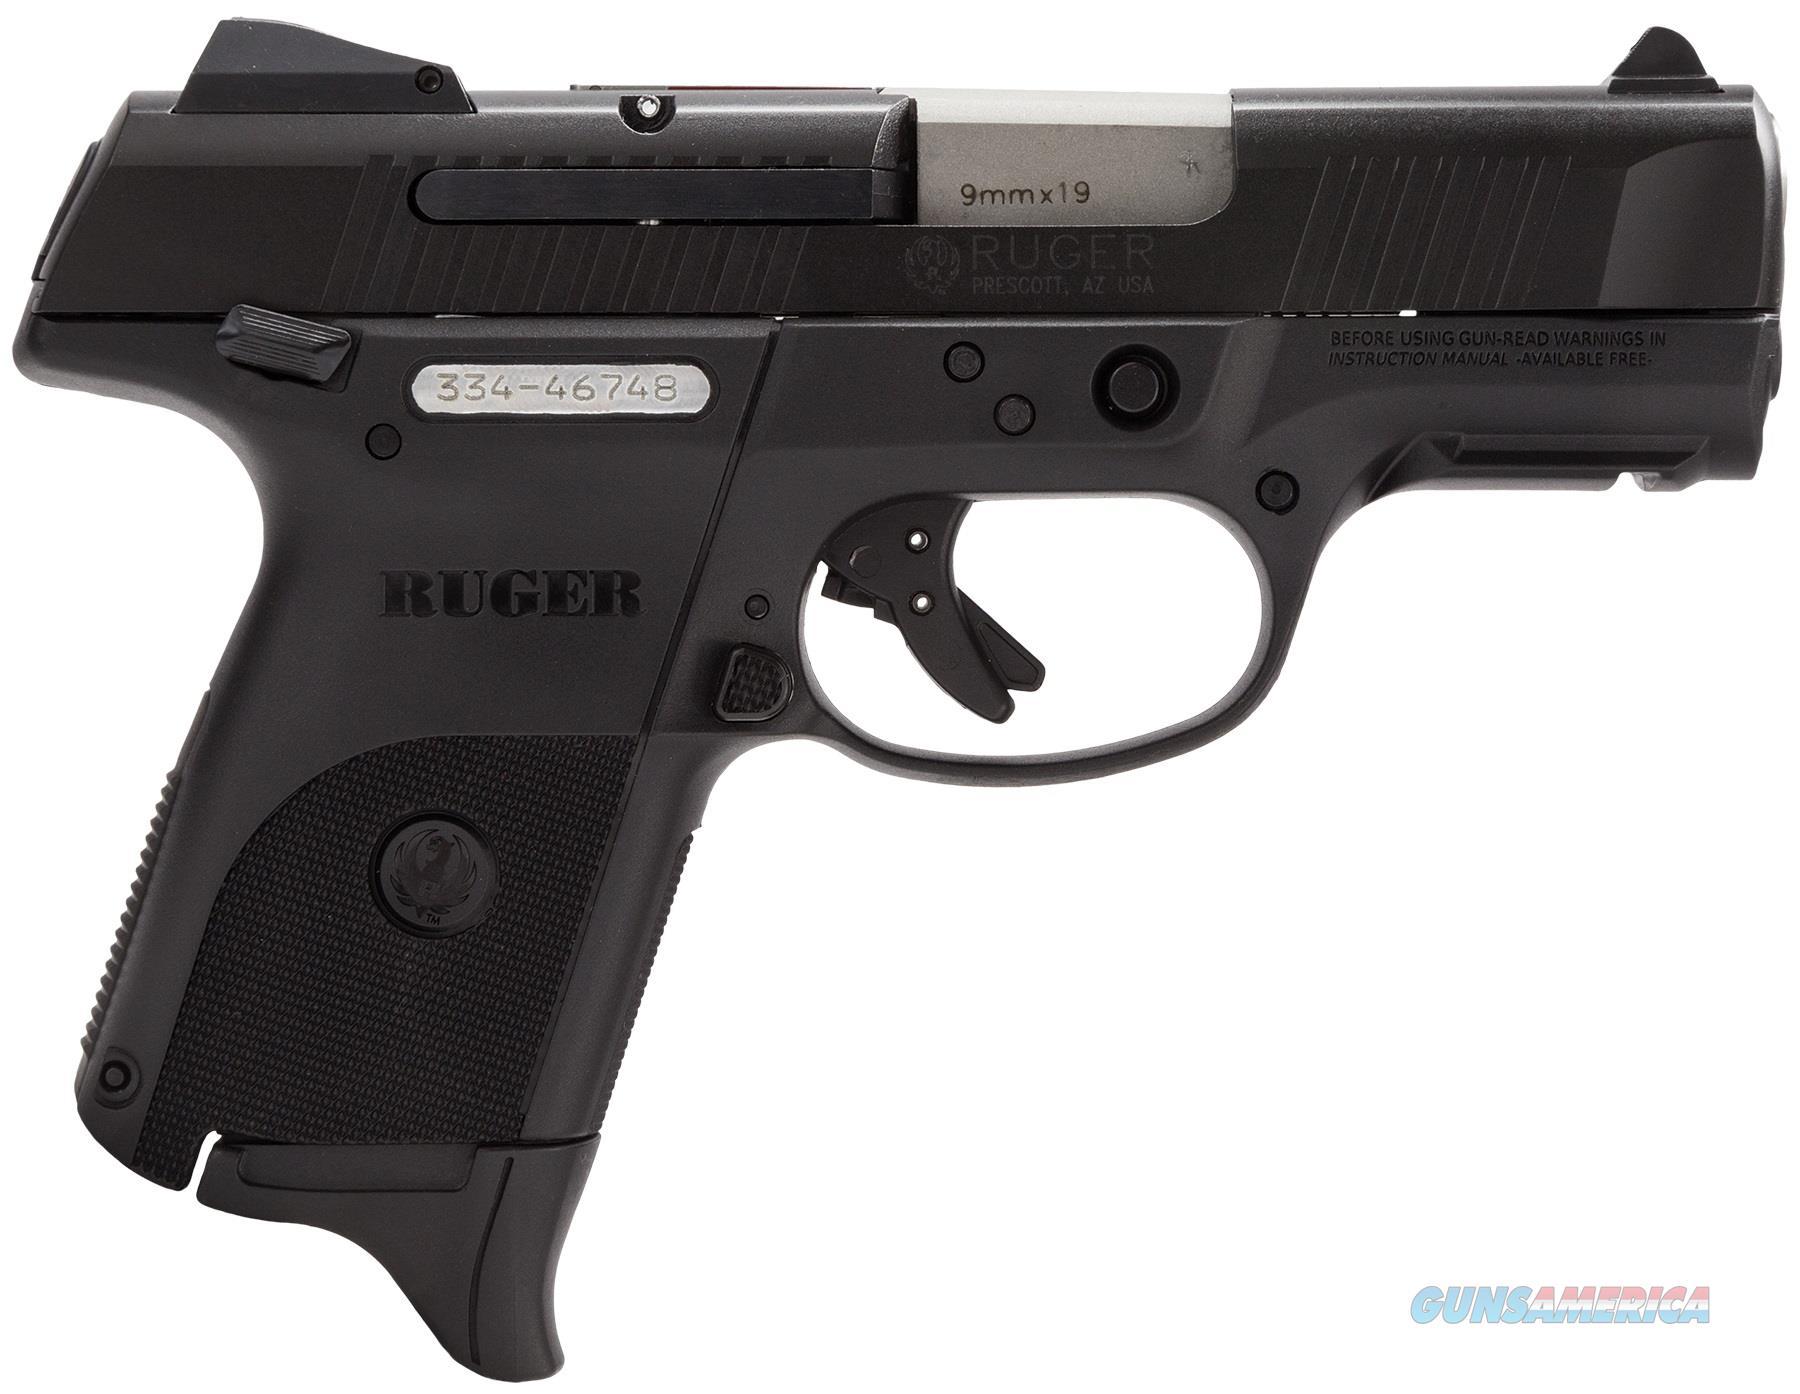 "Ruger SR9C Compact 9mm 3.4"" 17+1 - New in Box!  Guns > Pistols > Ruger Semi-Auto Pistols > SR Family > SR9C"